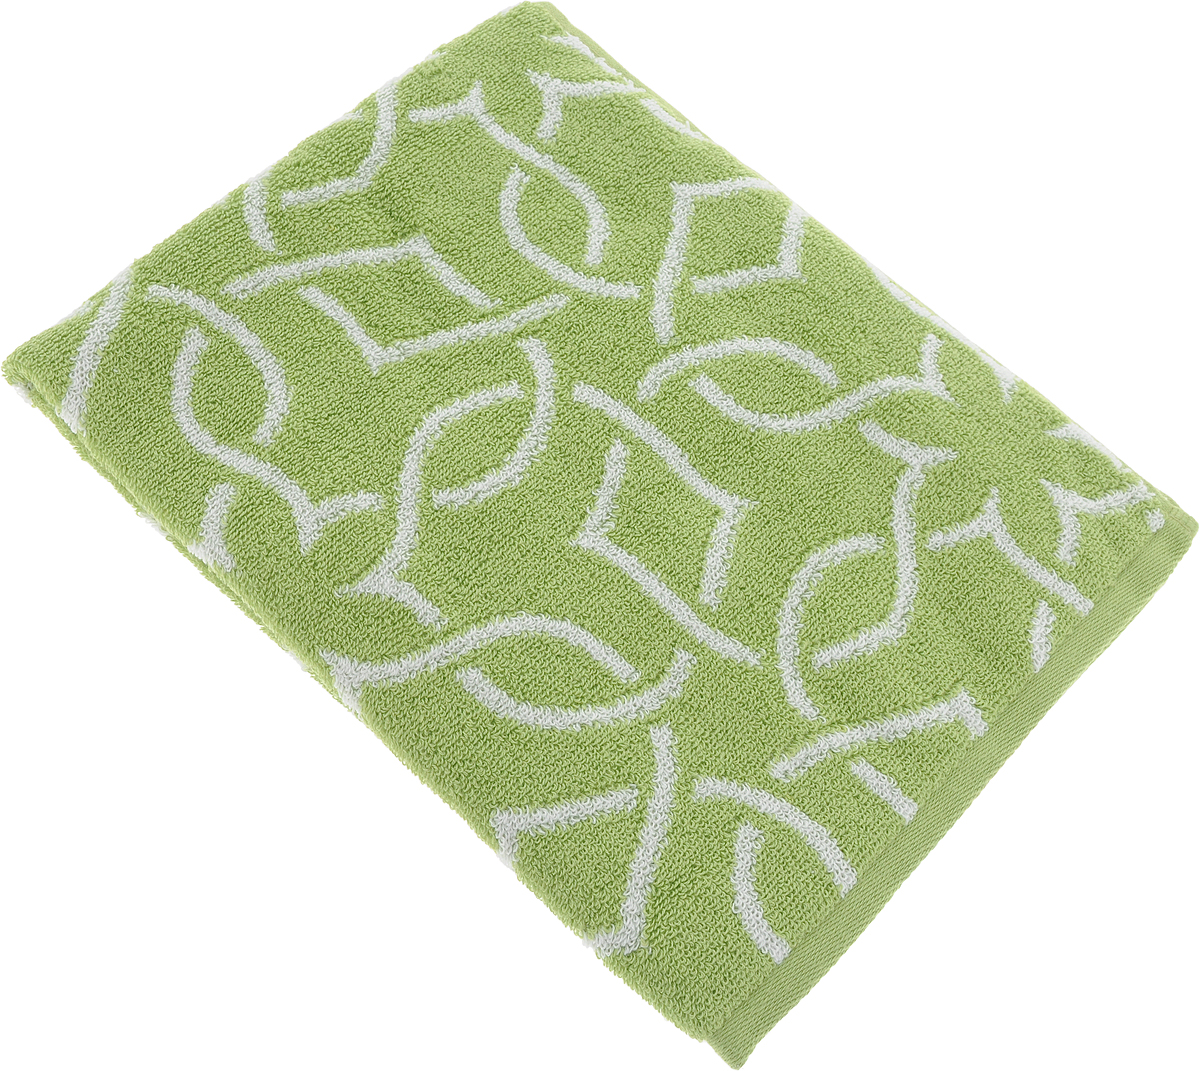 Полотенце для лица Aquarelle Стамбул, цвет: белый, травяной, 50 х 90 см. 710393 полотенце махровое aquarelle таллин 1 цвет ваниль 50 х 90 см 707762